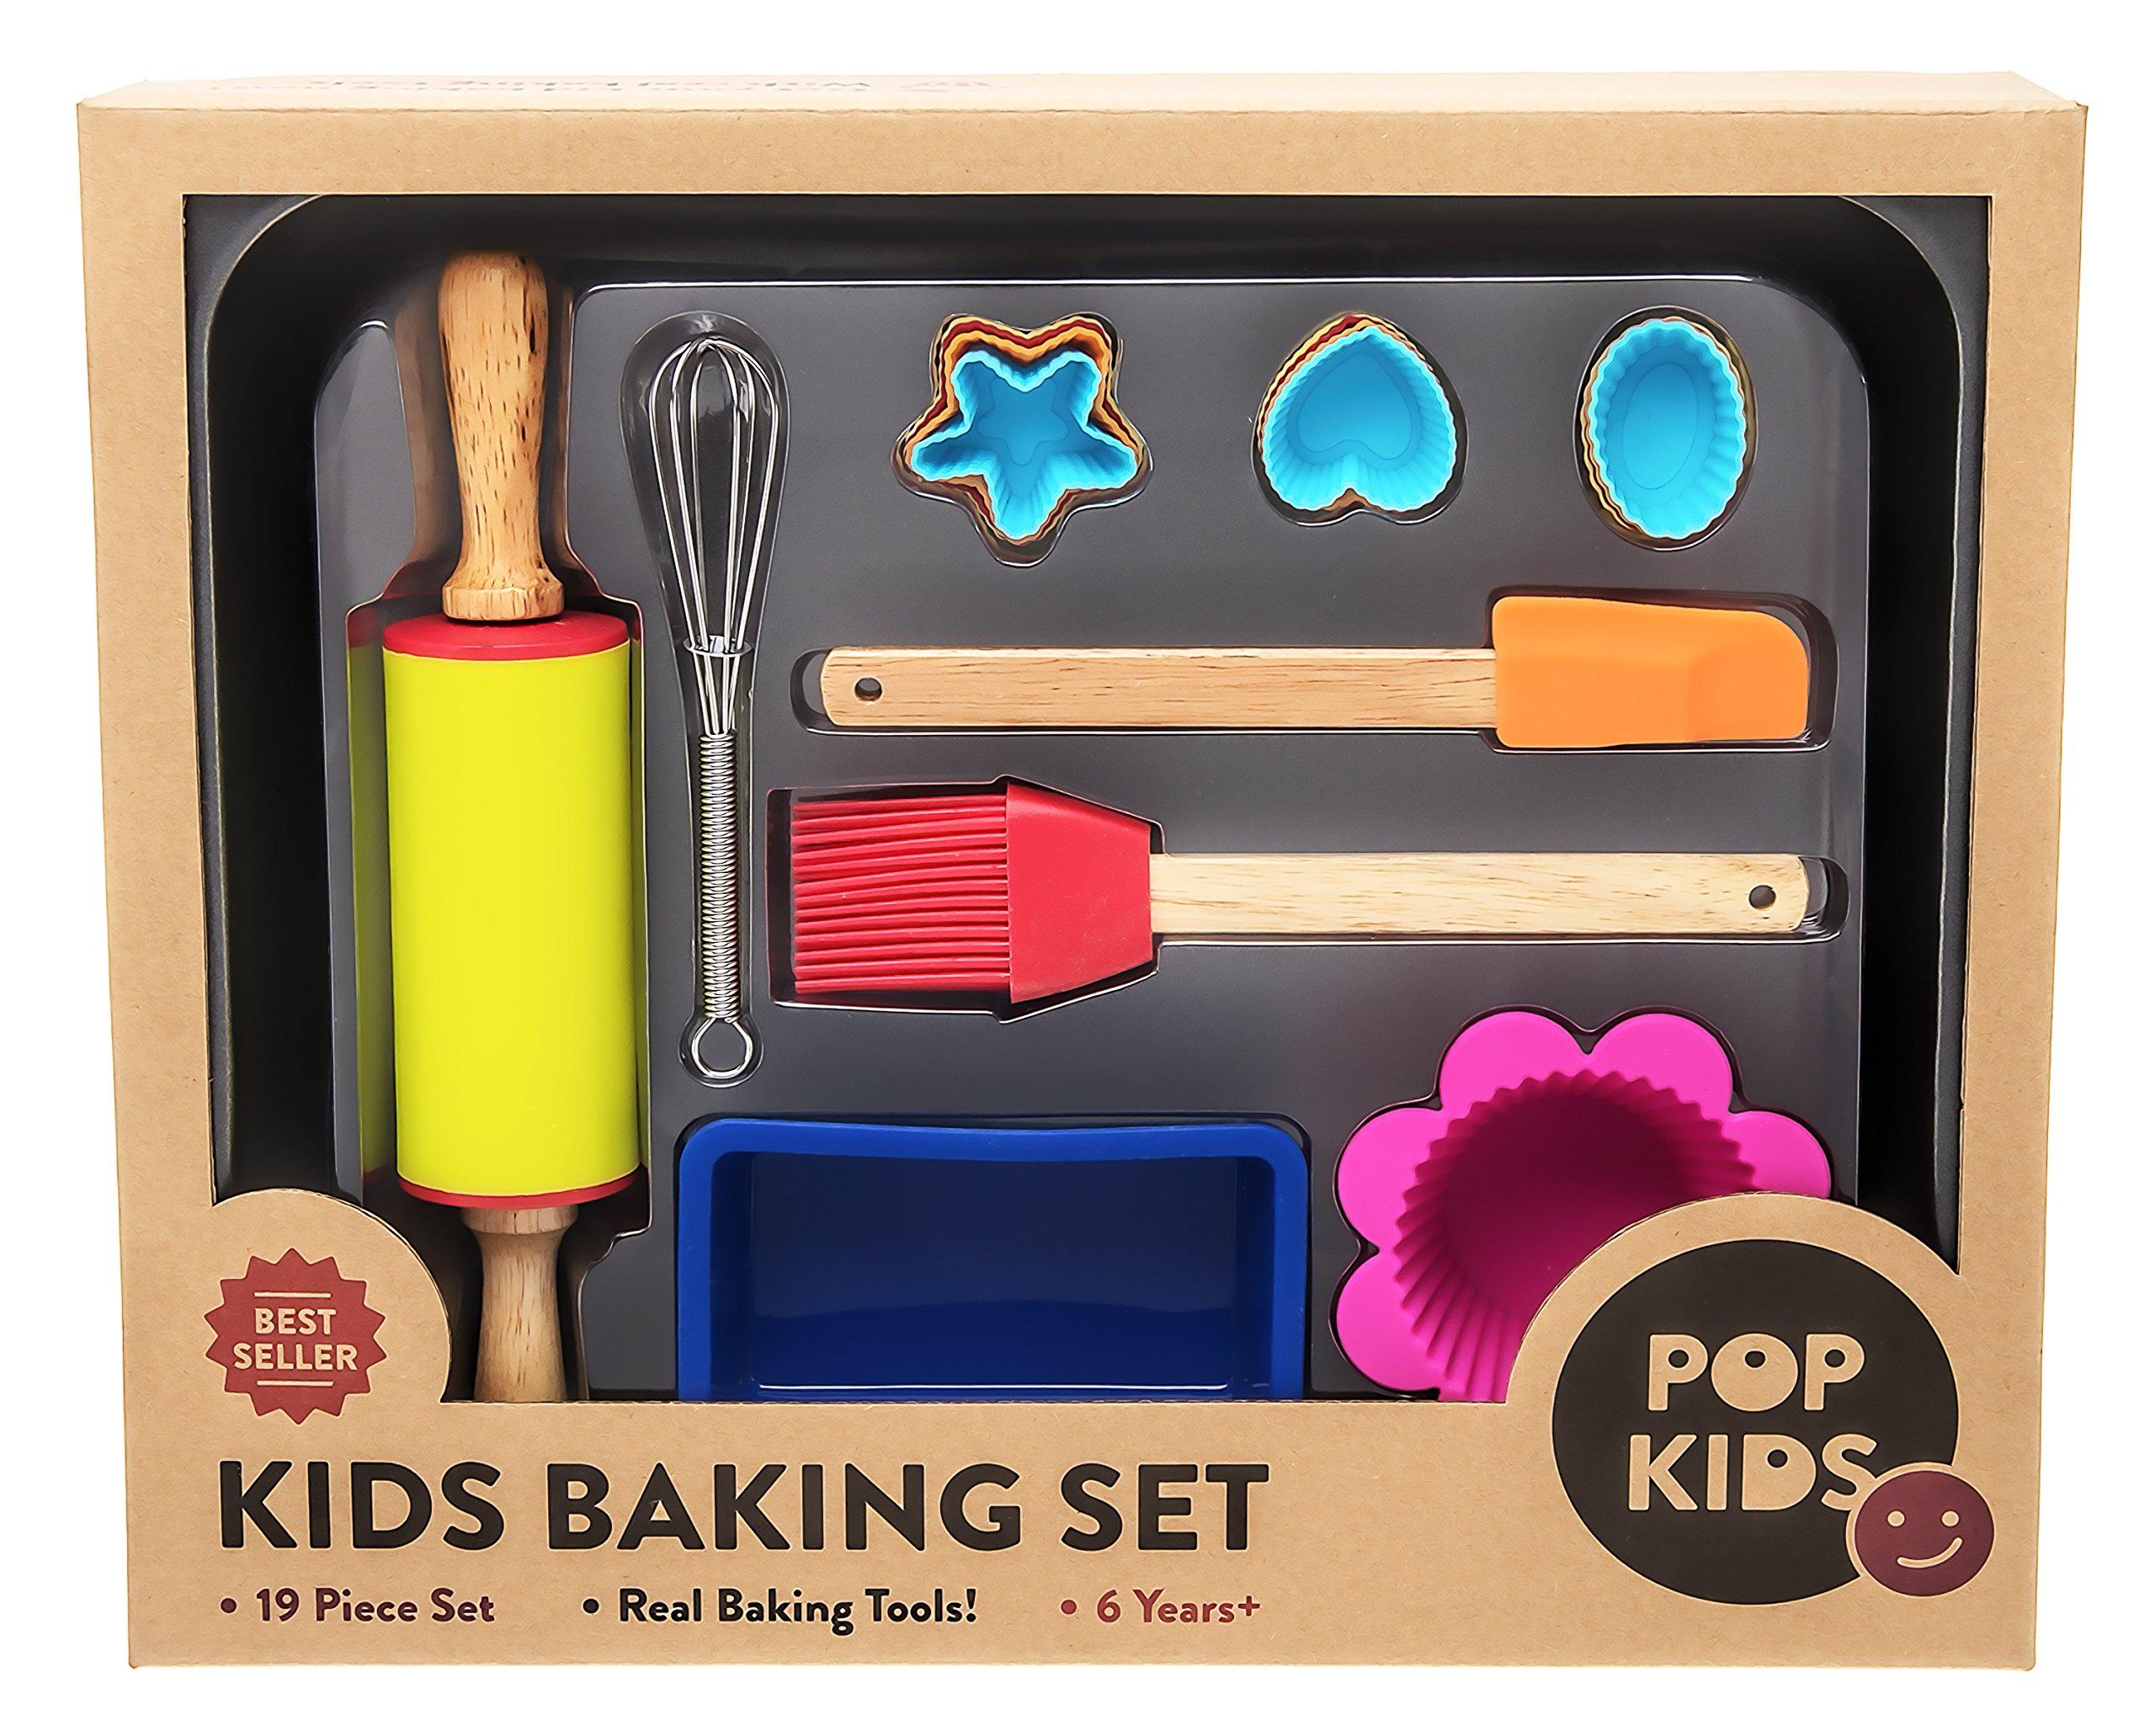 Pop Kids Baking Set for Family Fun Premium 19-Piece Kit for Children Learning to Bake by Pop Kids